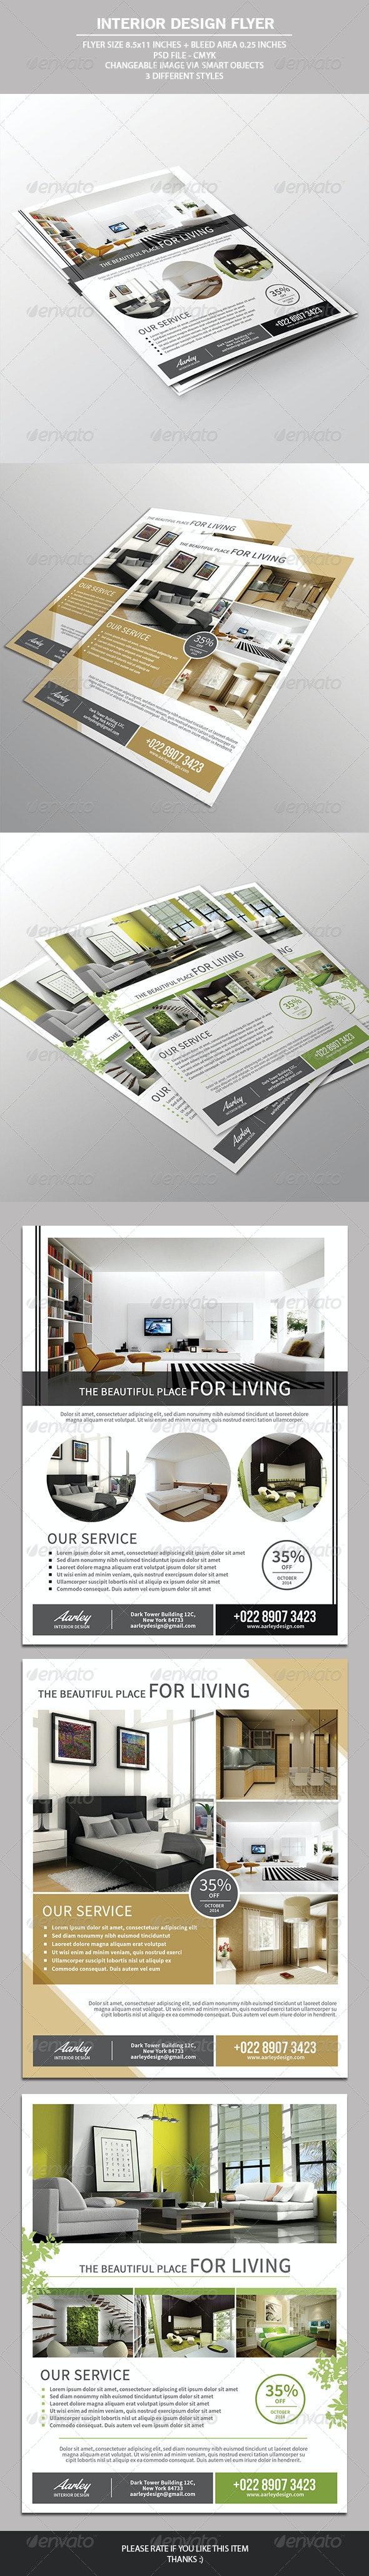 Interior Design Flyer - Commerce Flyers